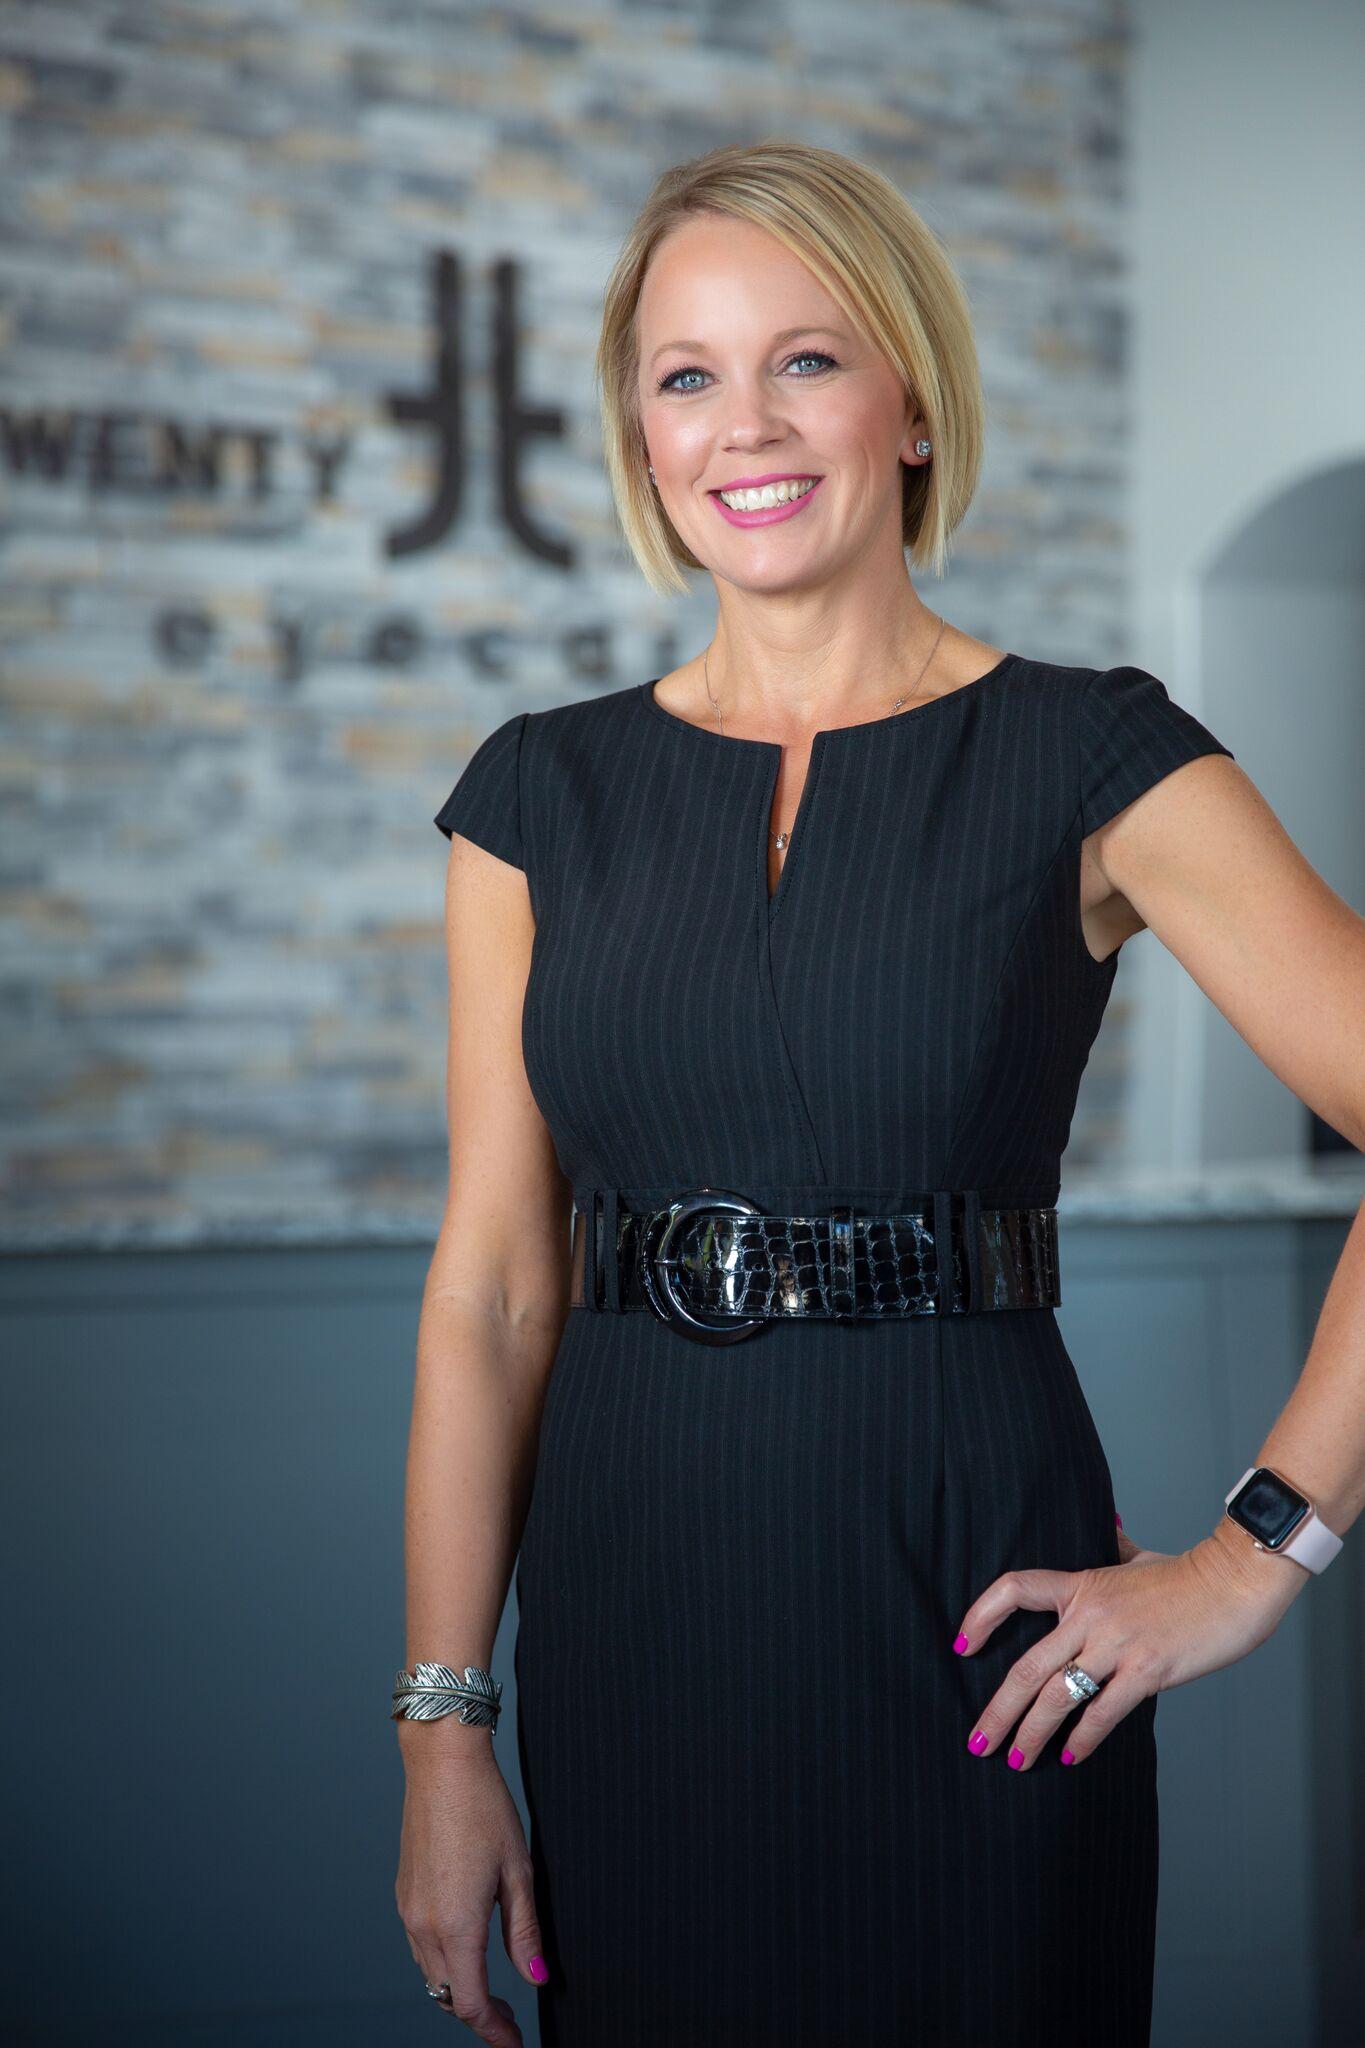 Dr Shannon Morgans Twenty Twenty Eye Care Optometrists in Tulsa